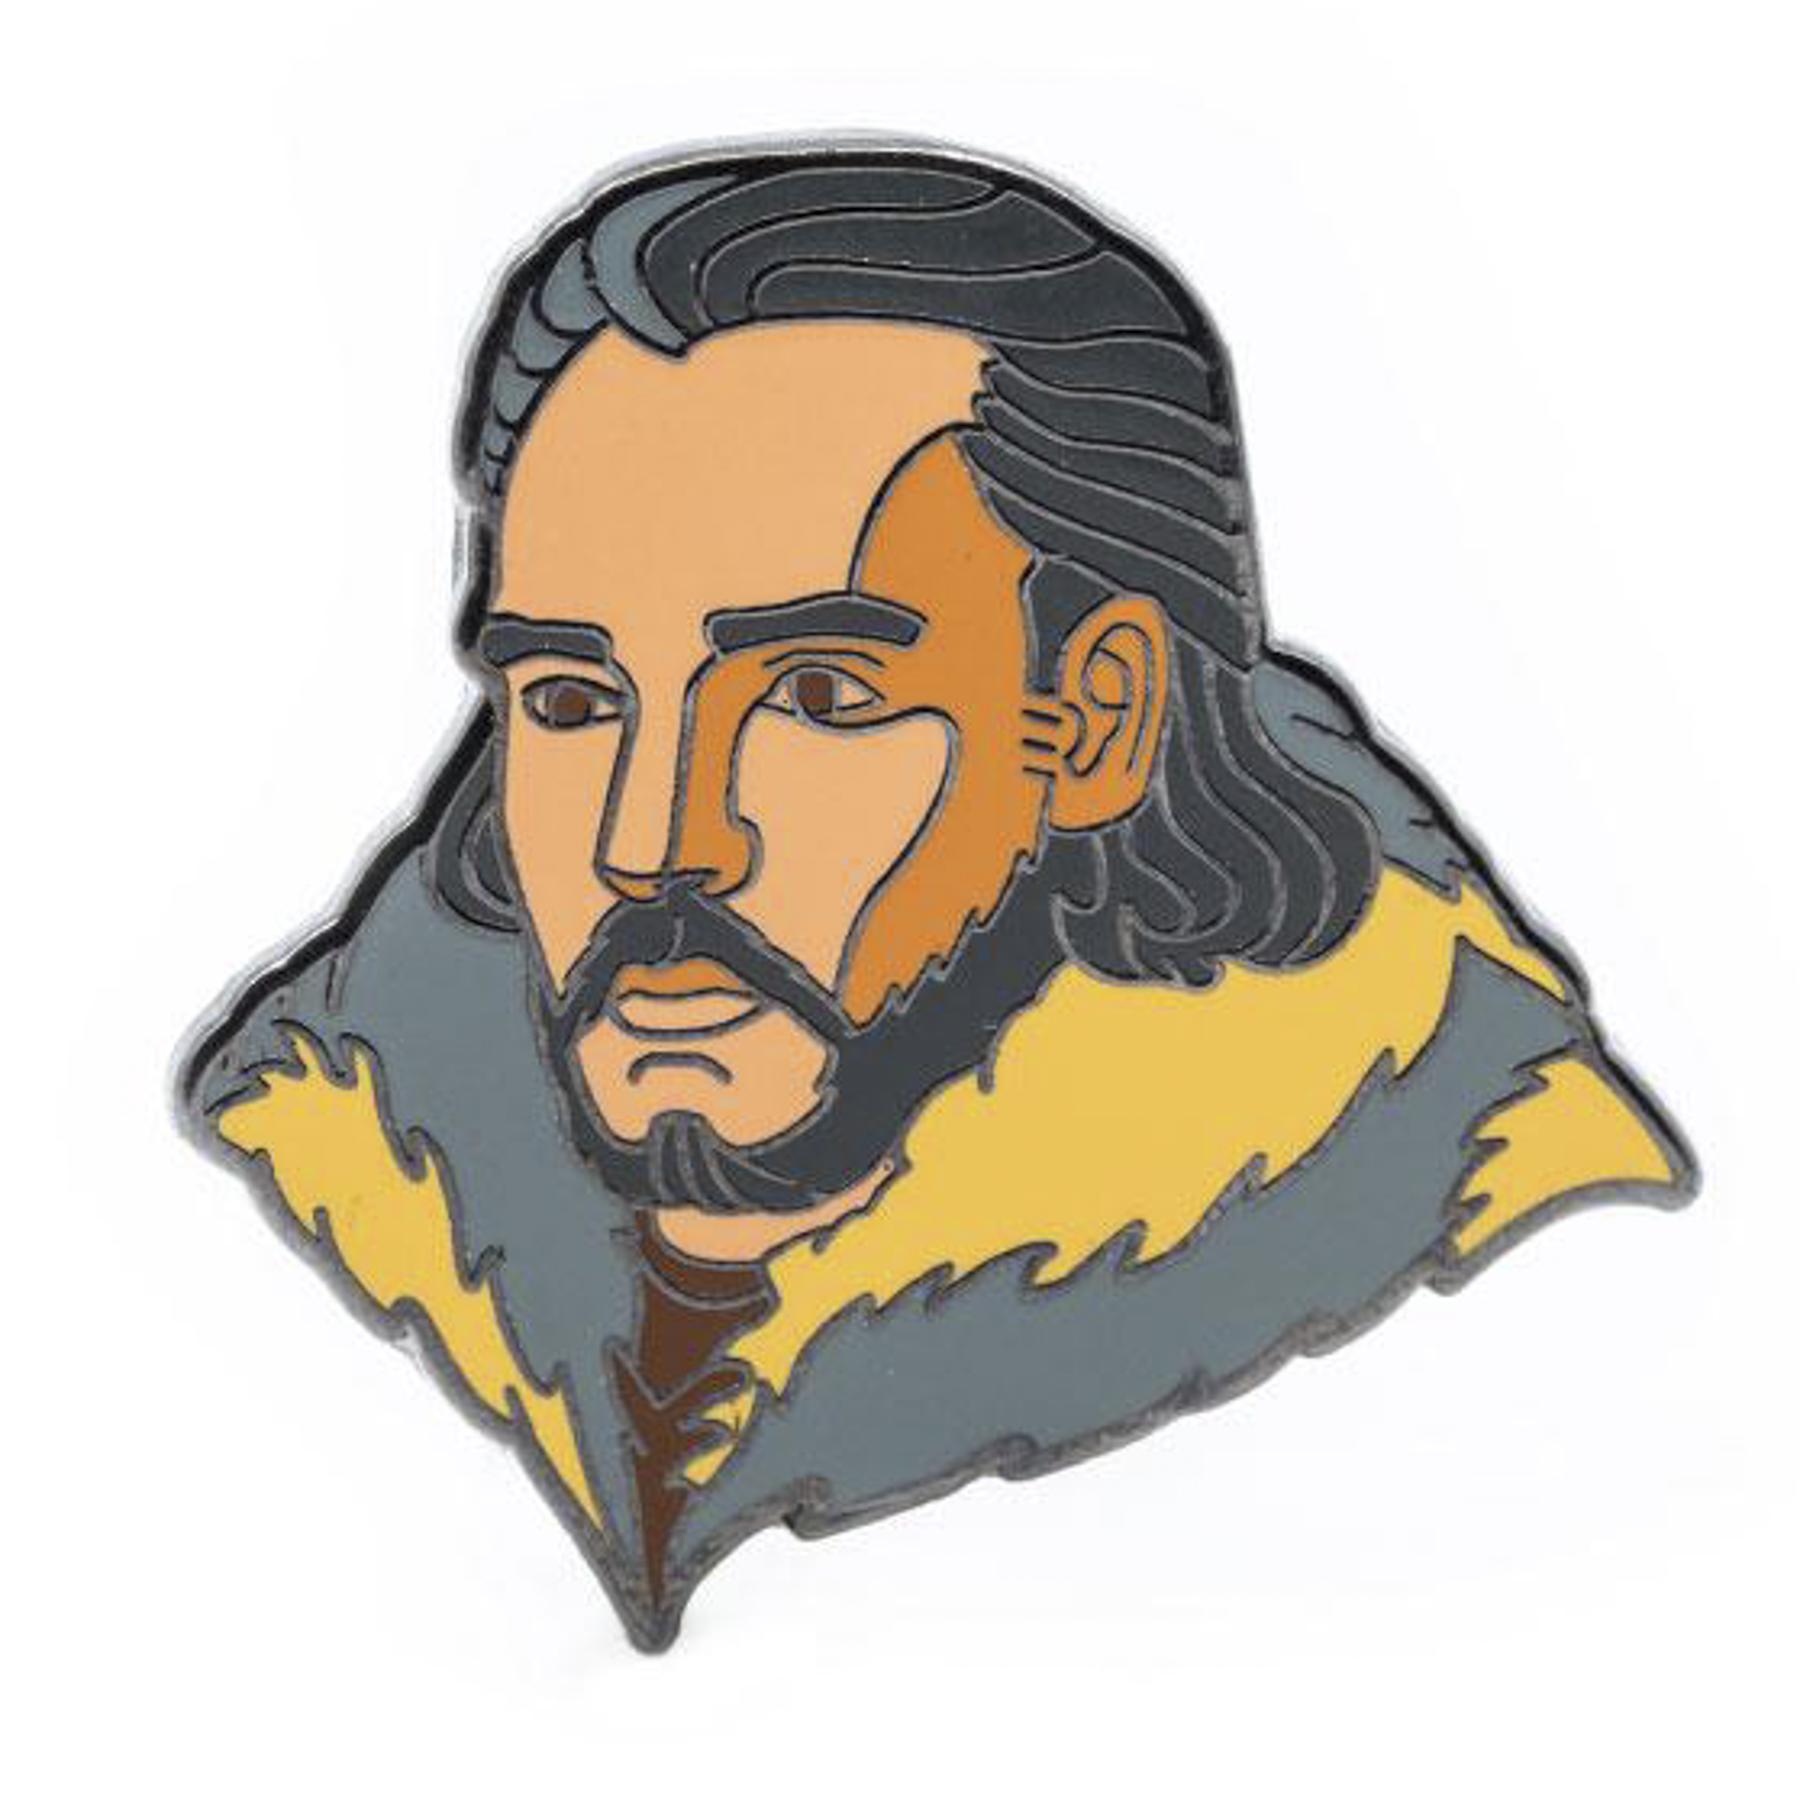 Robert Ball Jon Snow Pin from Game of Thrones https://shop.hbo.com/products/robert-ball-jon-snow-pin-from-game-of-thrones CR: HBO Shop